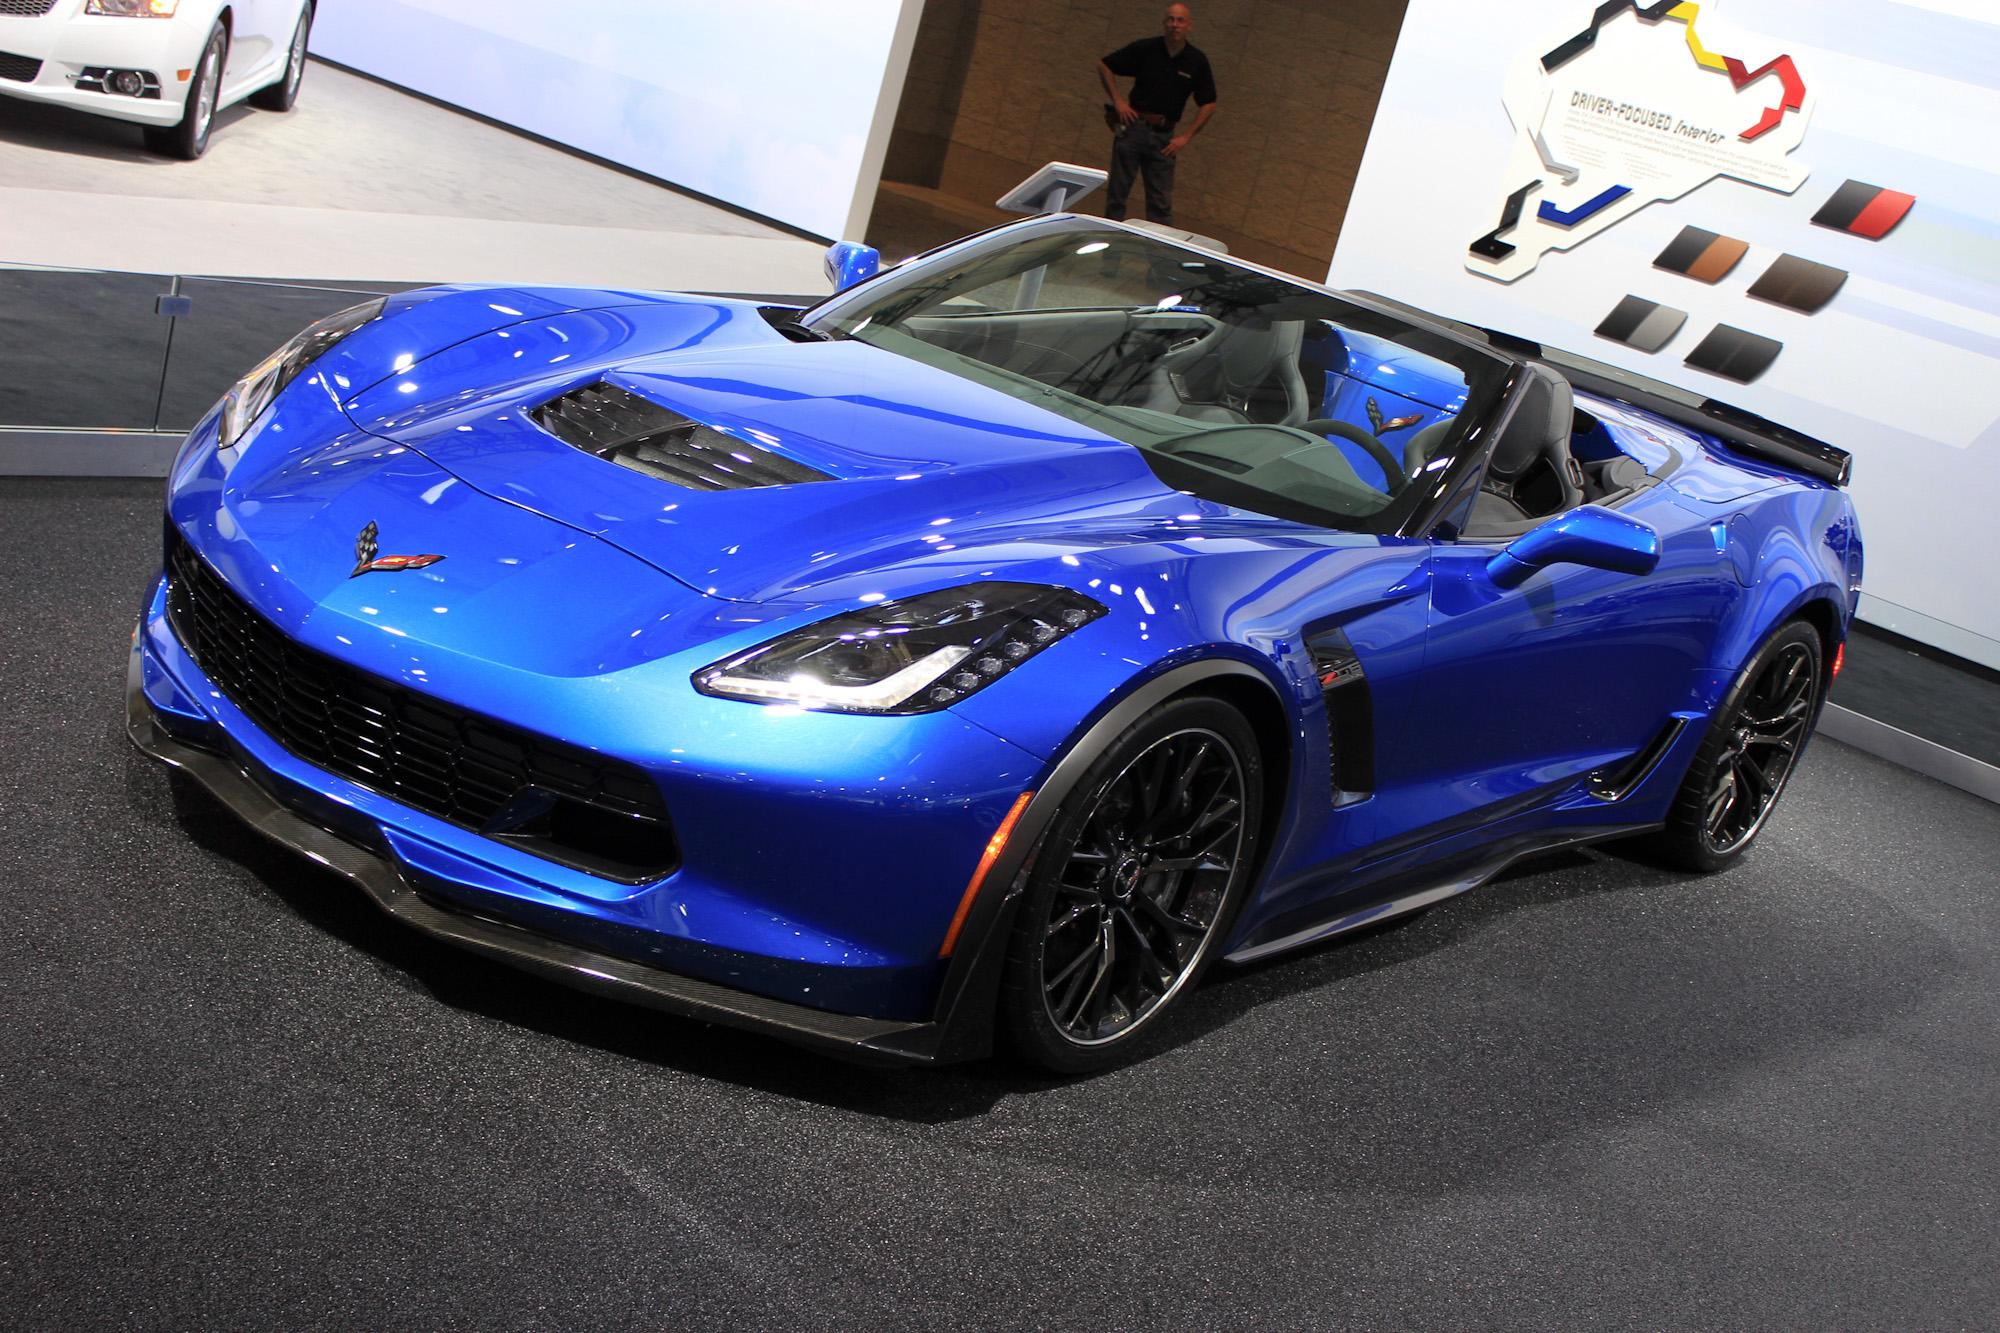 2015 corvette z06 2016 discovery sport new infiniti concept today s car news. Black Bedroom Furniture Sets. Home Design Ideas